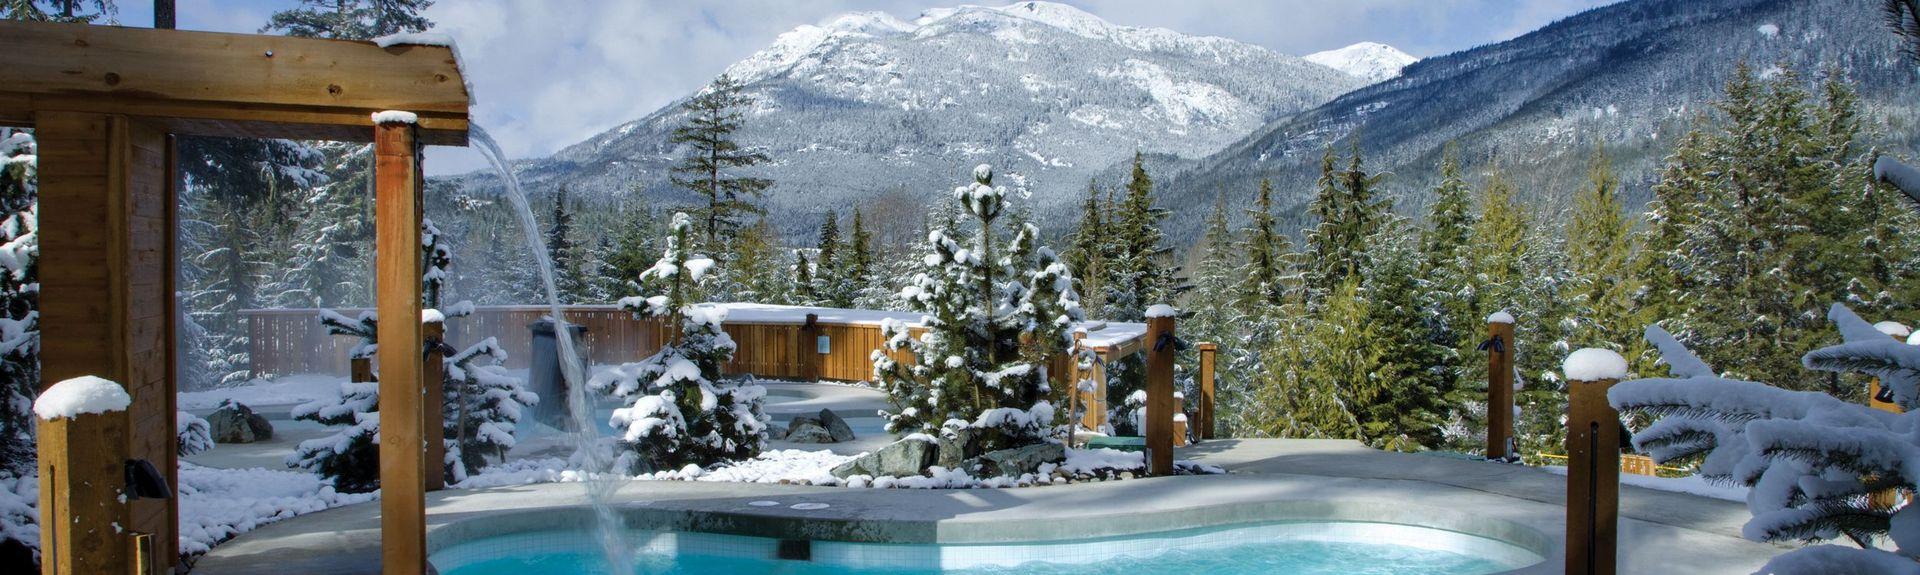 Mont-Tremblant Ski Resort, Mont-Tremblant, Quebec, Canadá